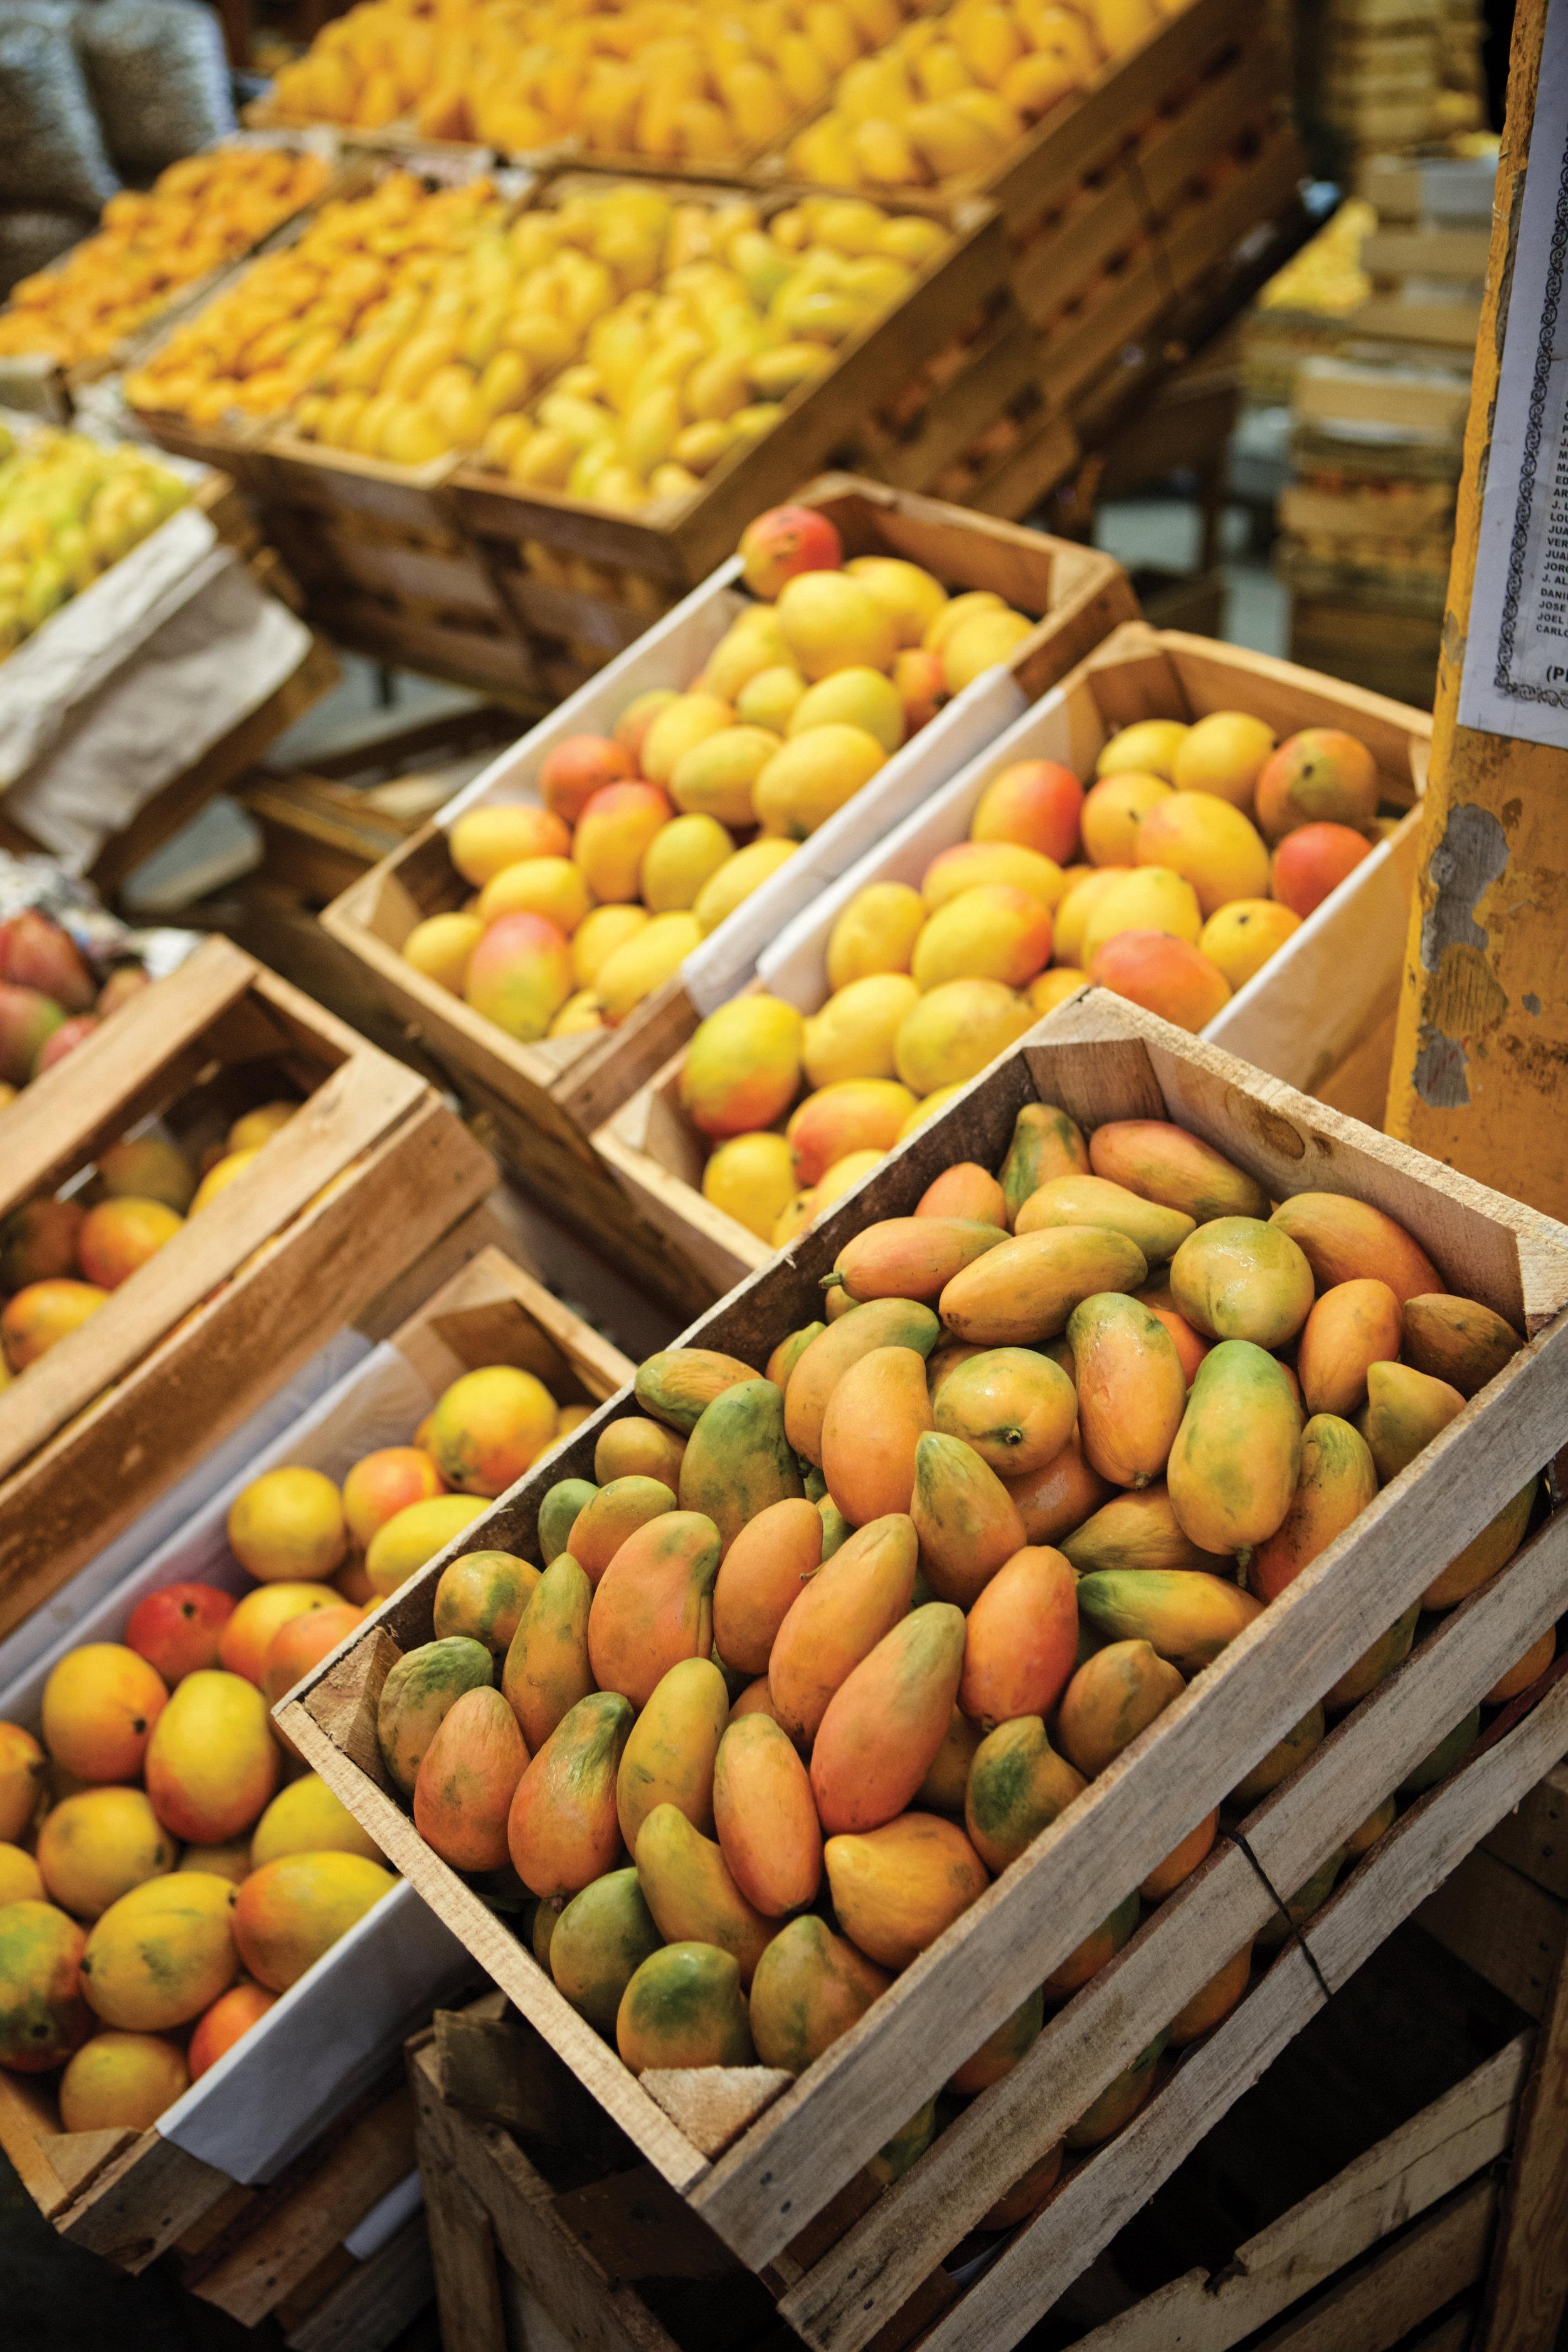 Copy of several crates full of mangos